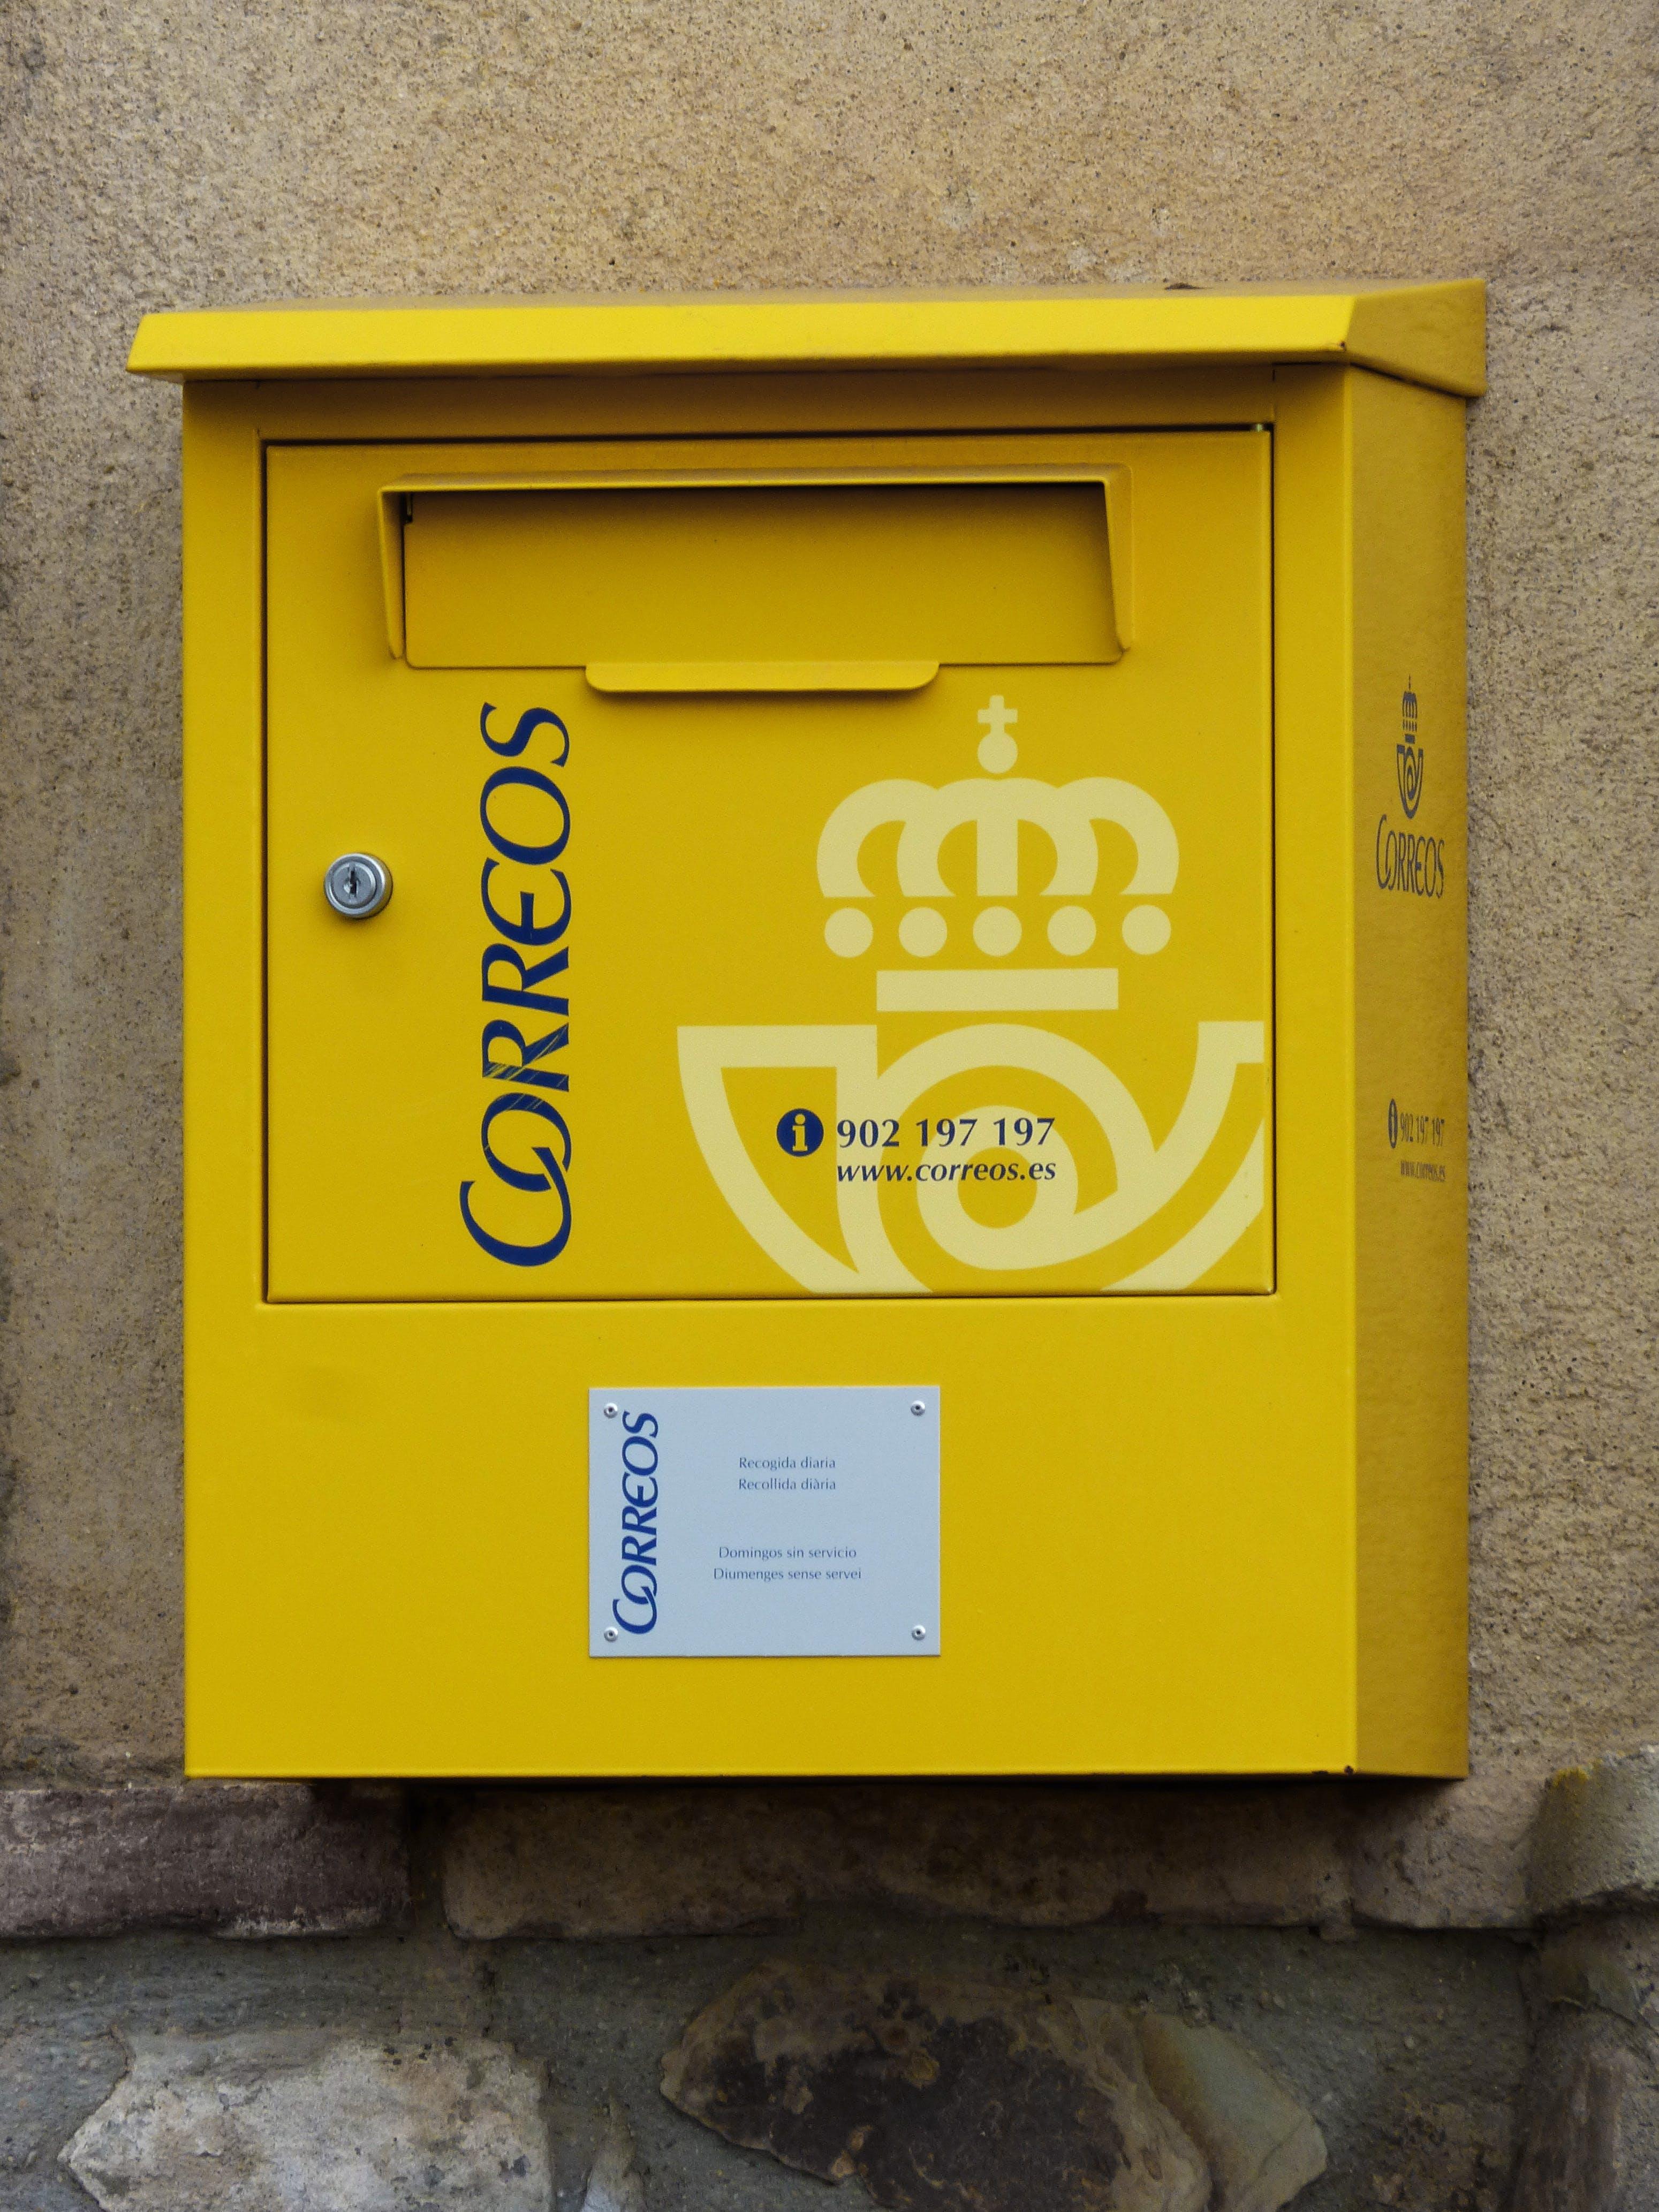 Free stock photo of mailbox, post, estafeta, postal service